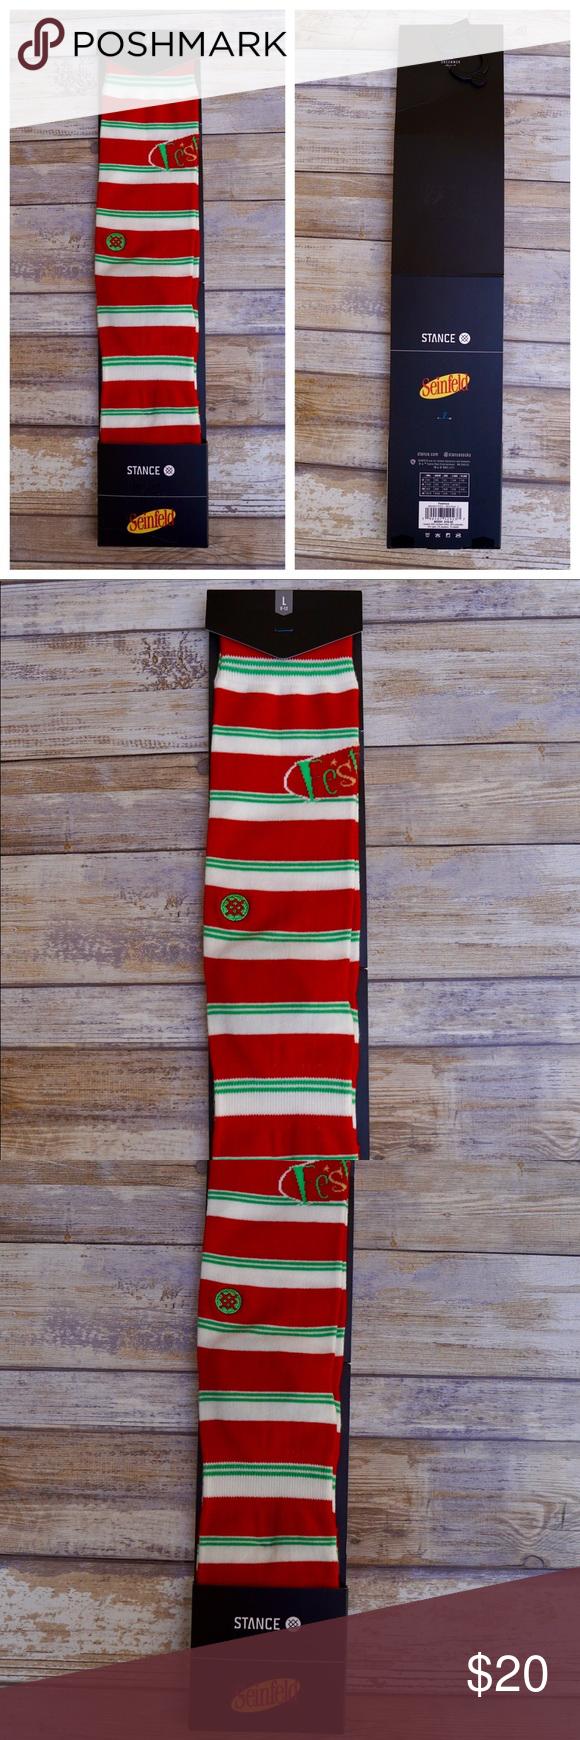 Stance Festivus Crew Socks Size L 9-12